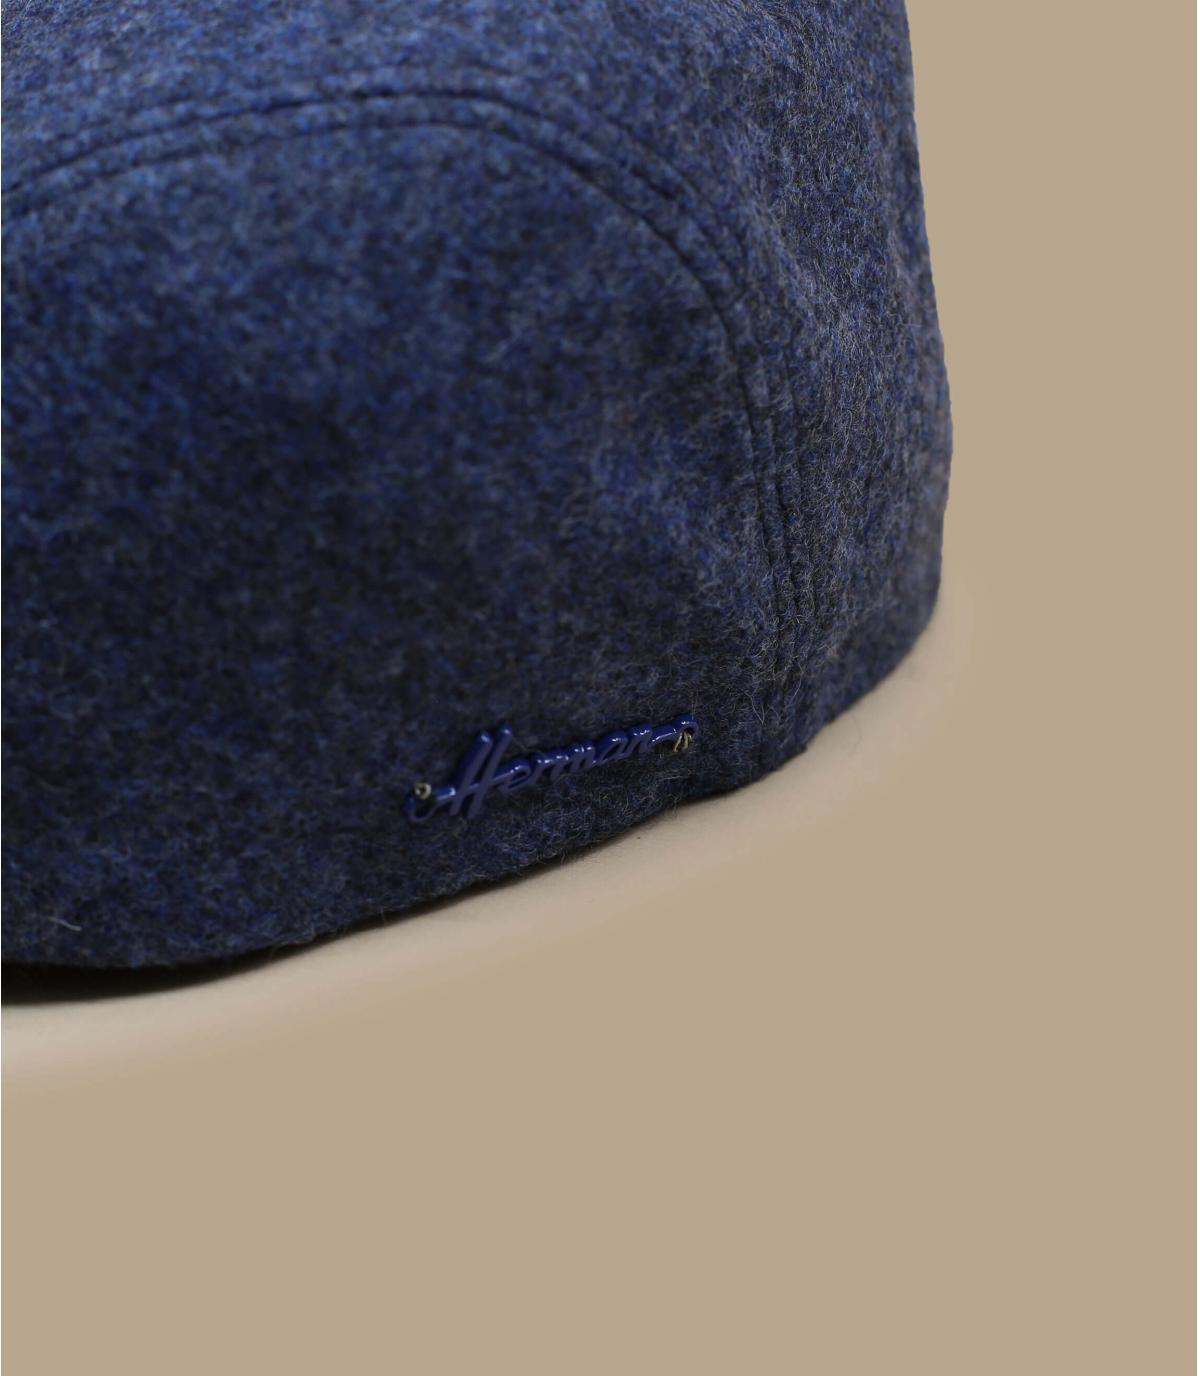 Détails Hill wool EF blue - image 2